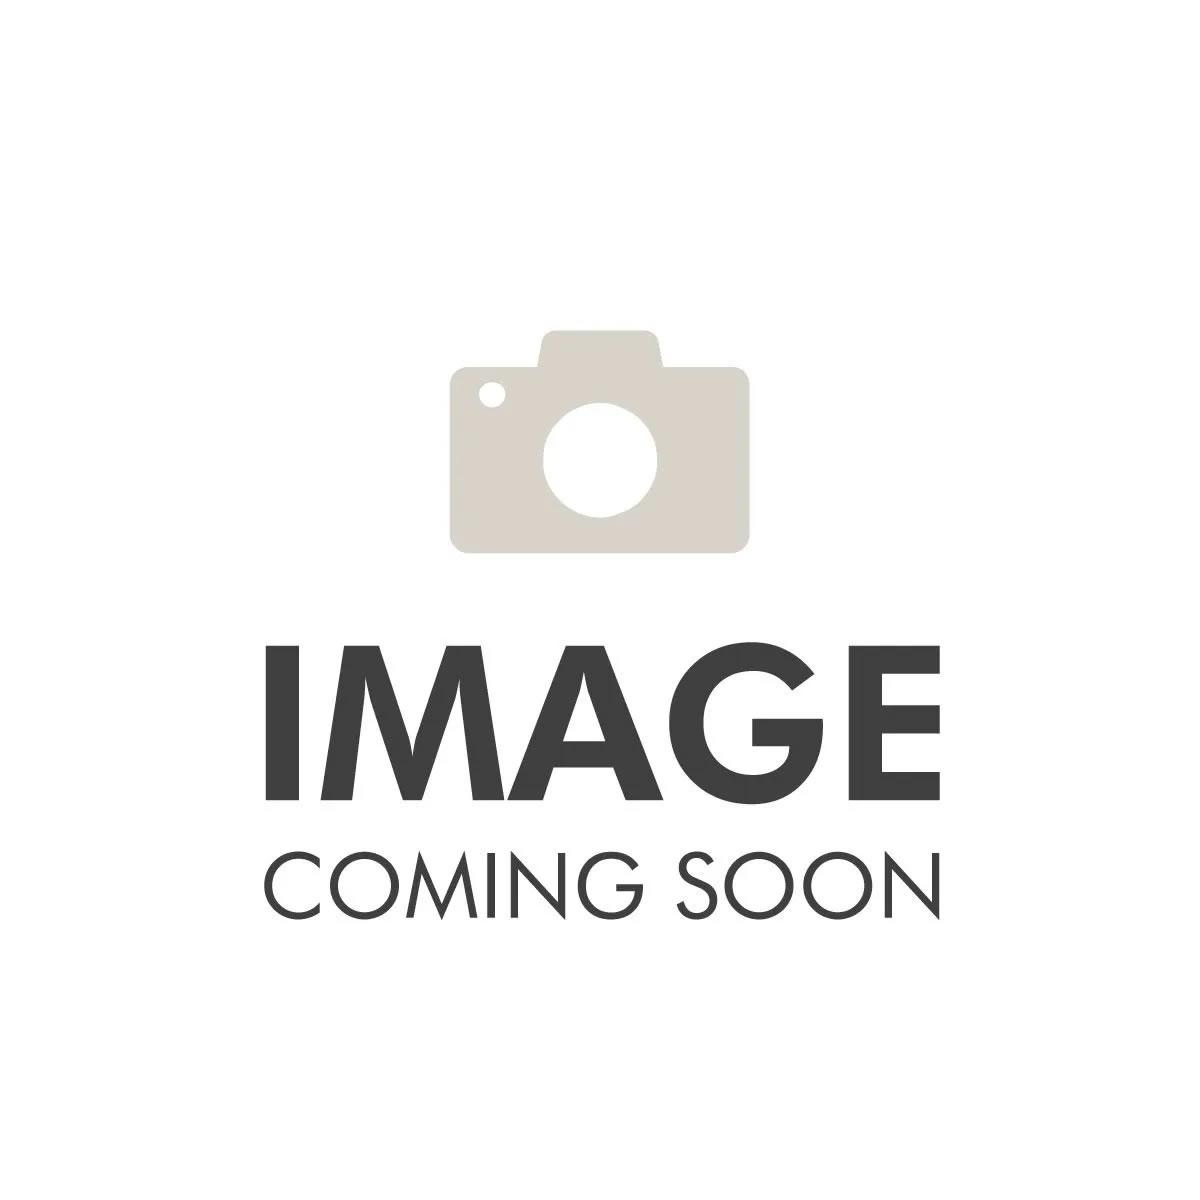 Fabric Seat Protectors, Gray; 76-06 Jeep CJ/Wrangler YJ/TJ